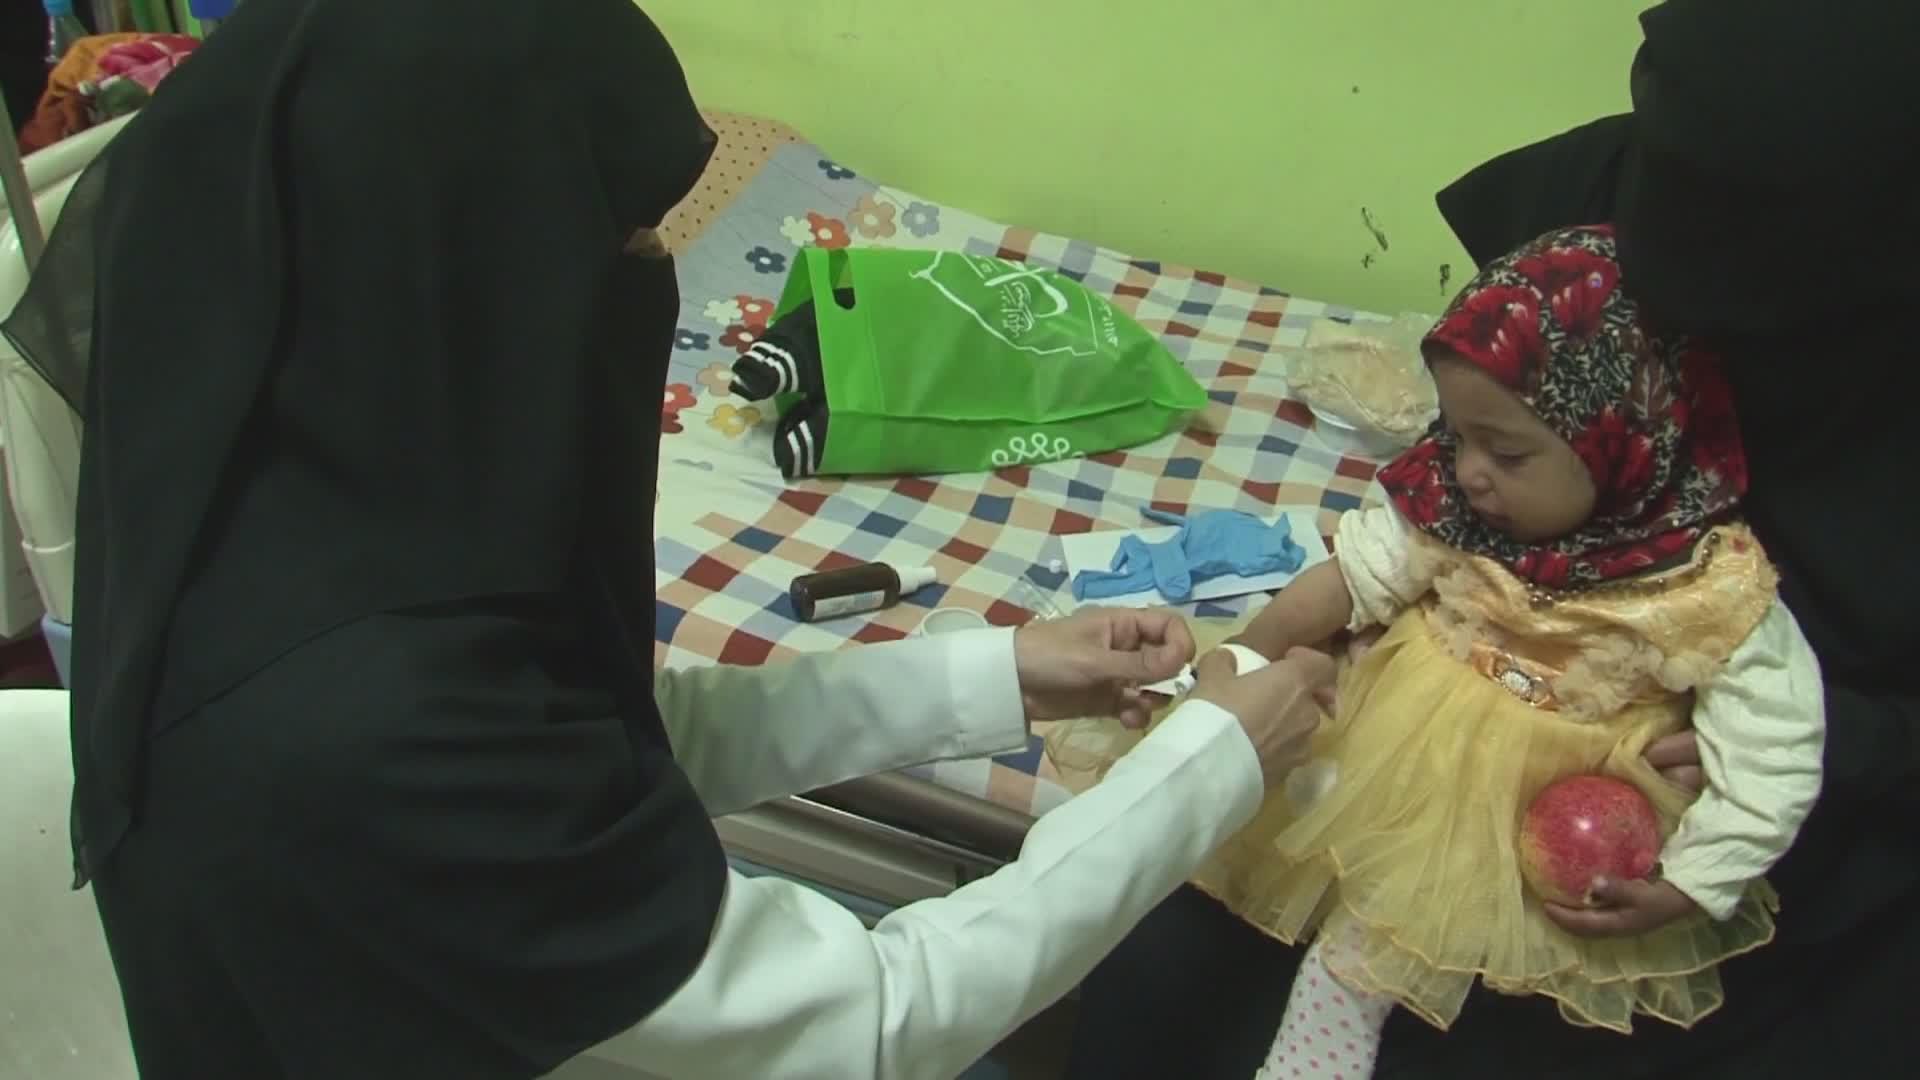 Yemeni children with leukemia in dire need of medical supplies